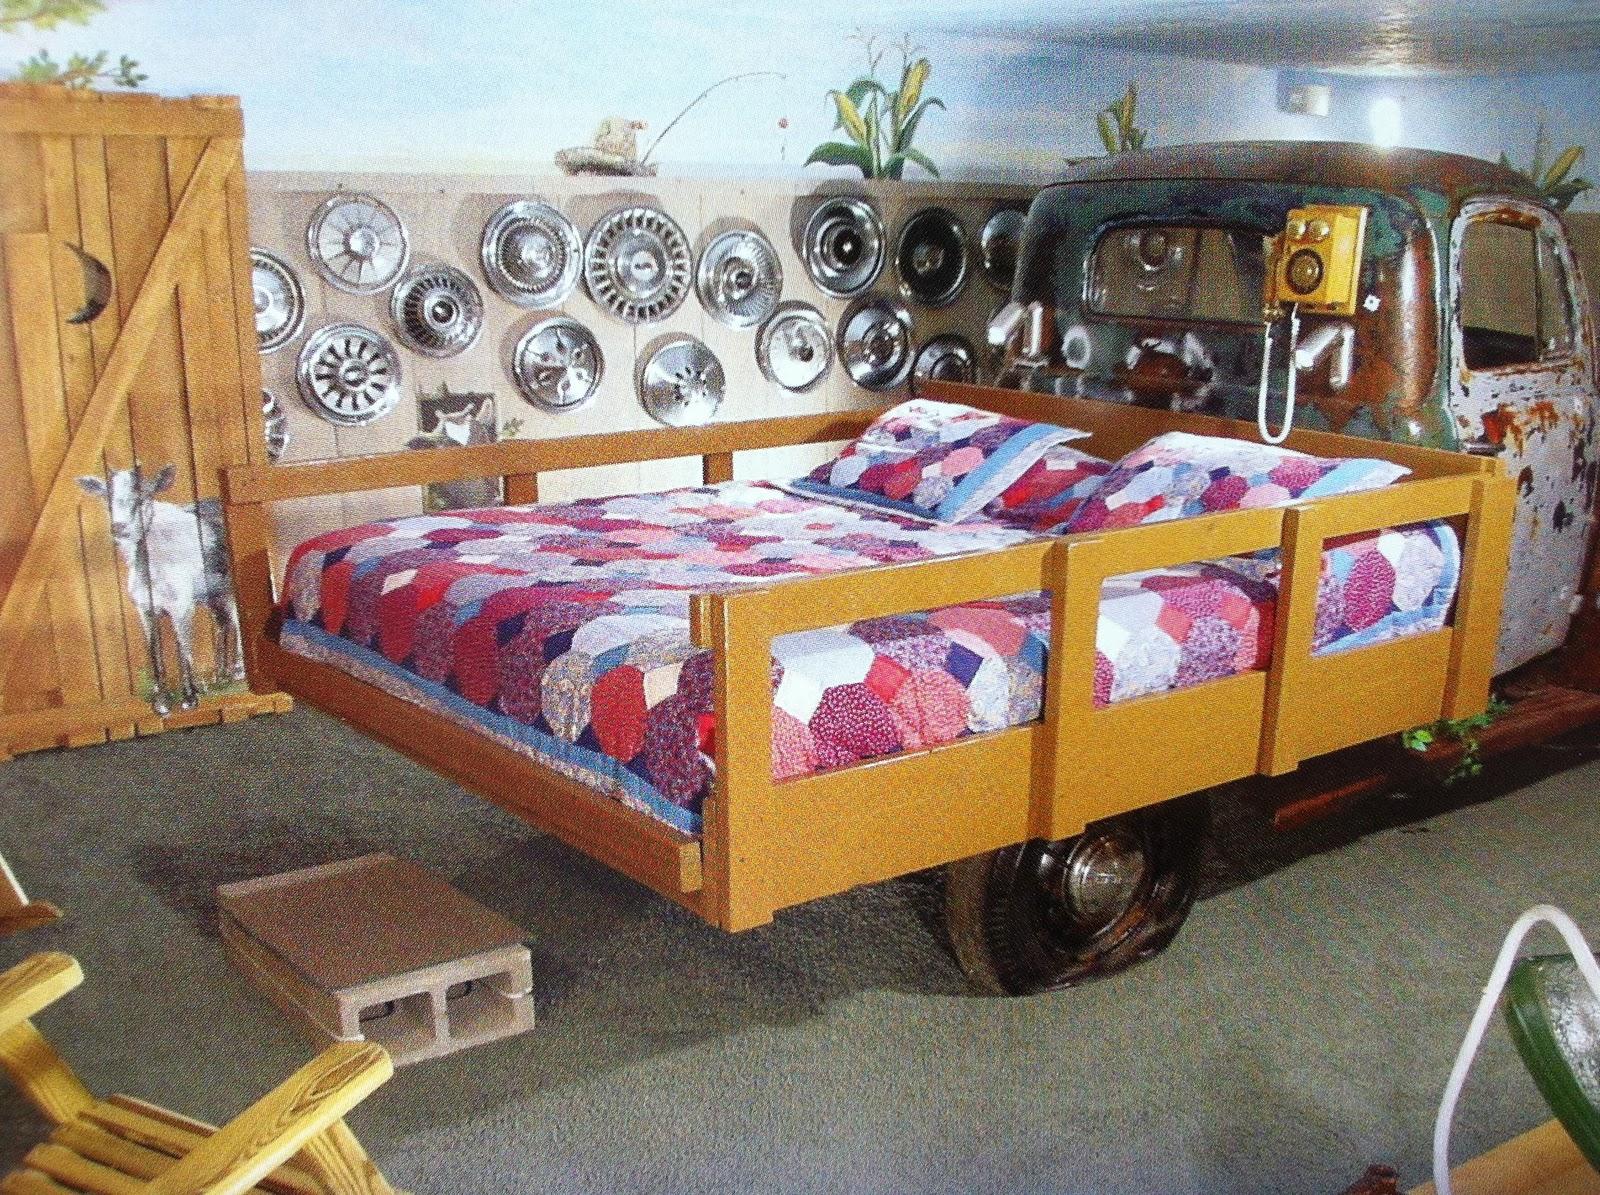 wildwood inn hillbilly room theme. Black Bedroom Furniture Sets. Home Design Ideas